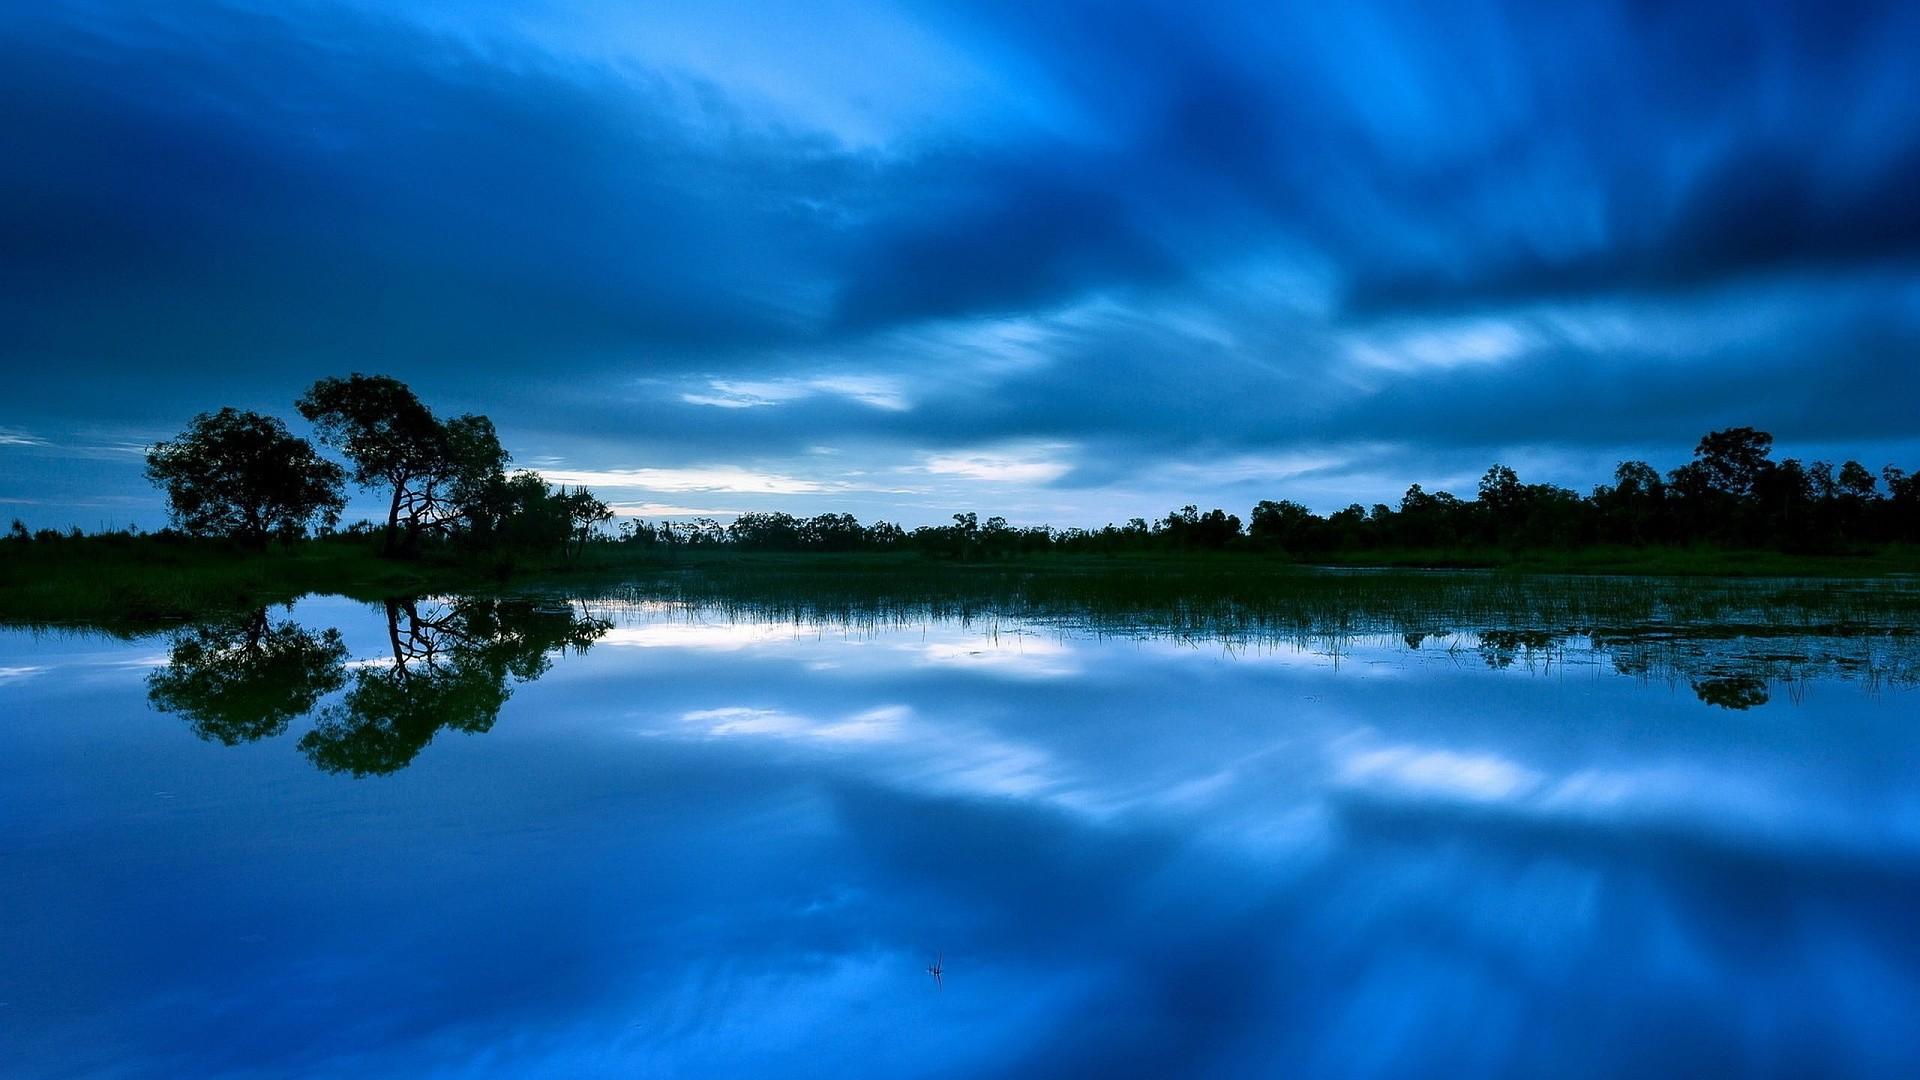 Adorable Blue Images, Blue Wallpaper .